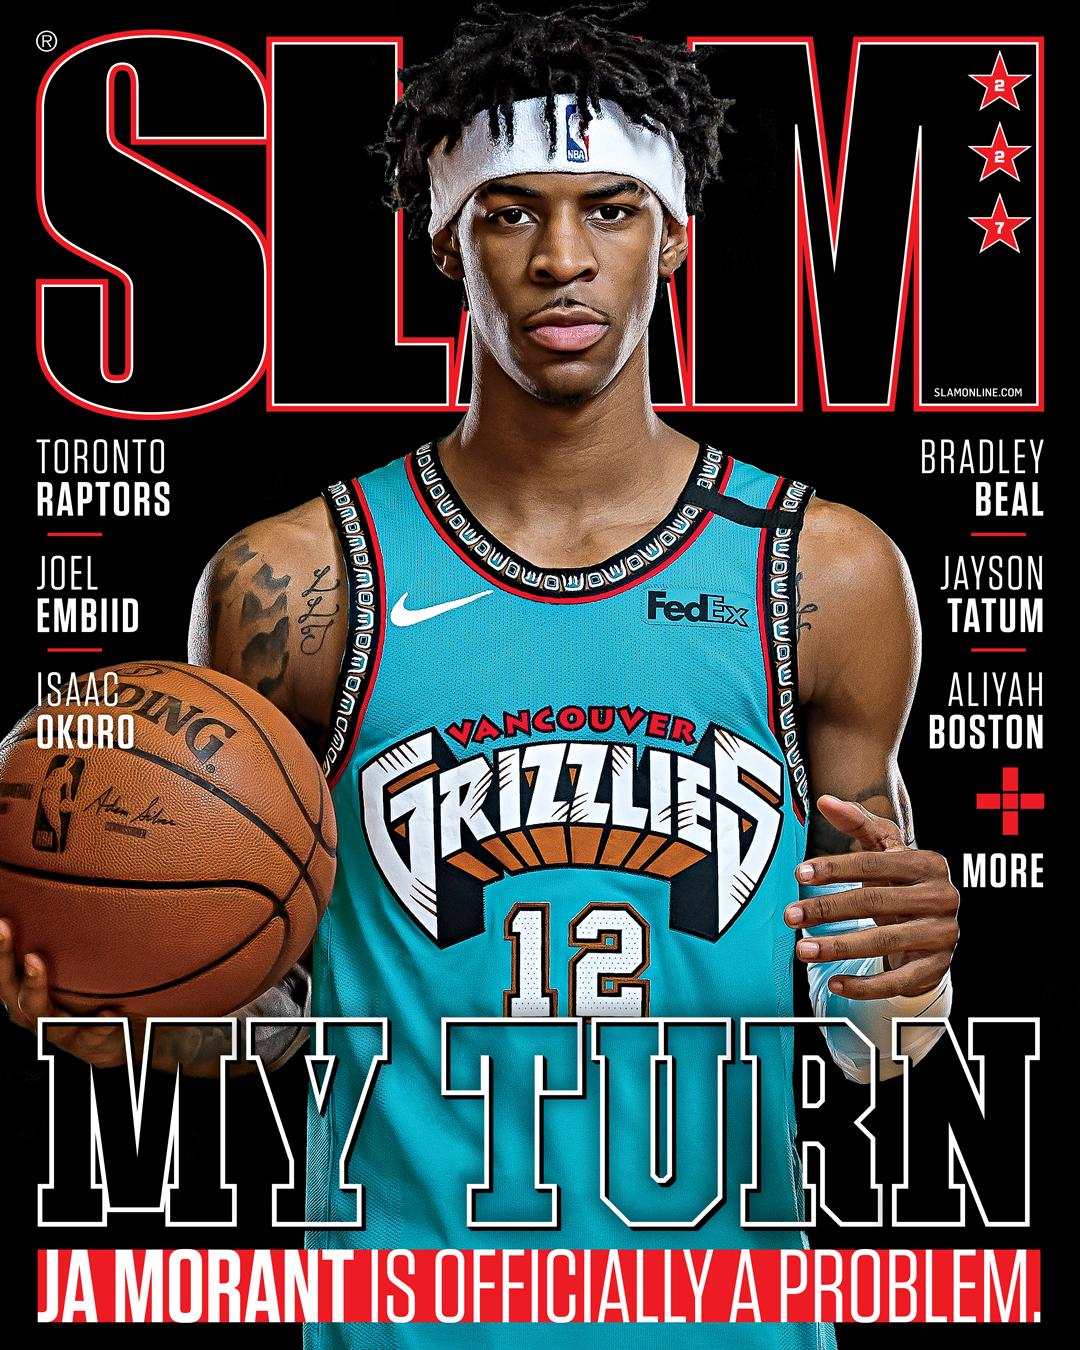 5-6 NBA Kids /& Youth Boys Motion Offense Short Sleeve Performance Tee New York Knicks-Blue-M